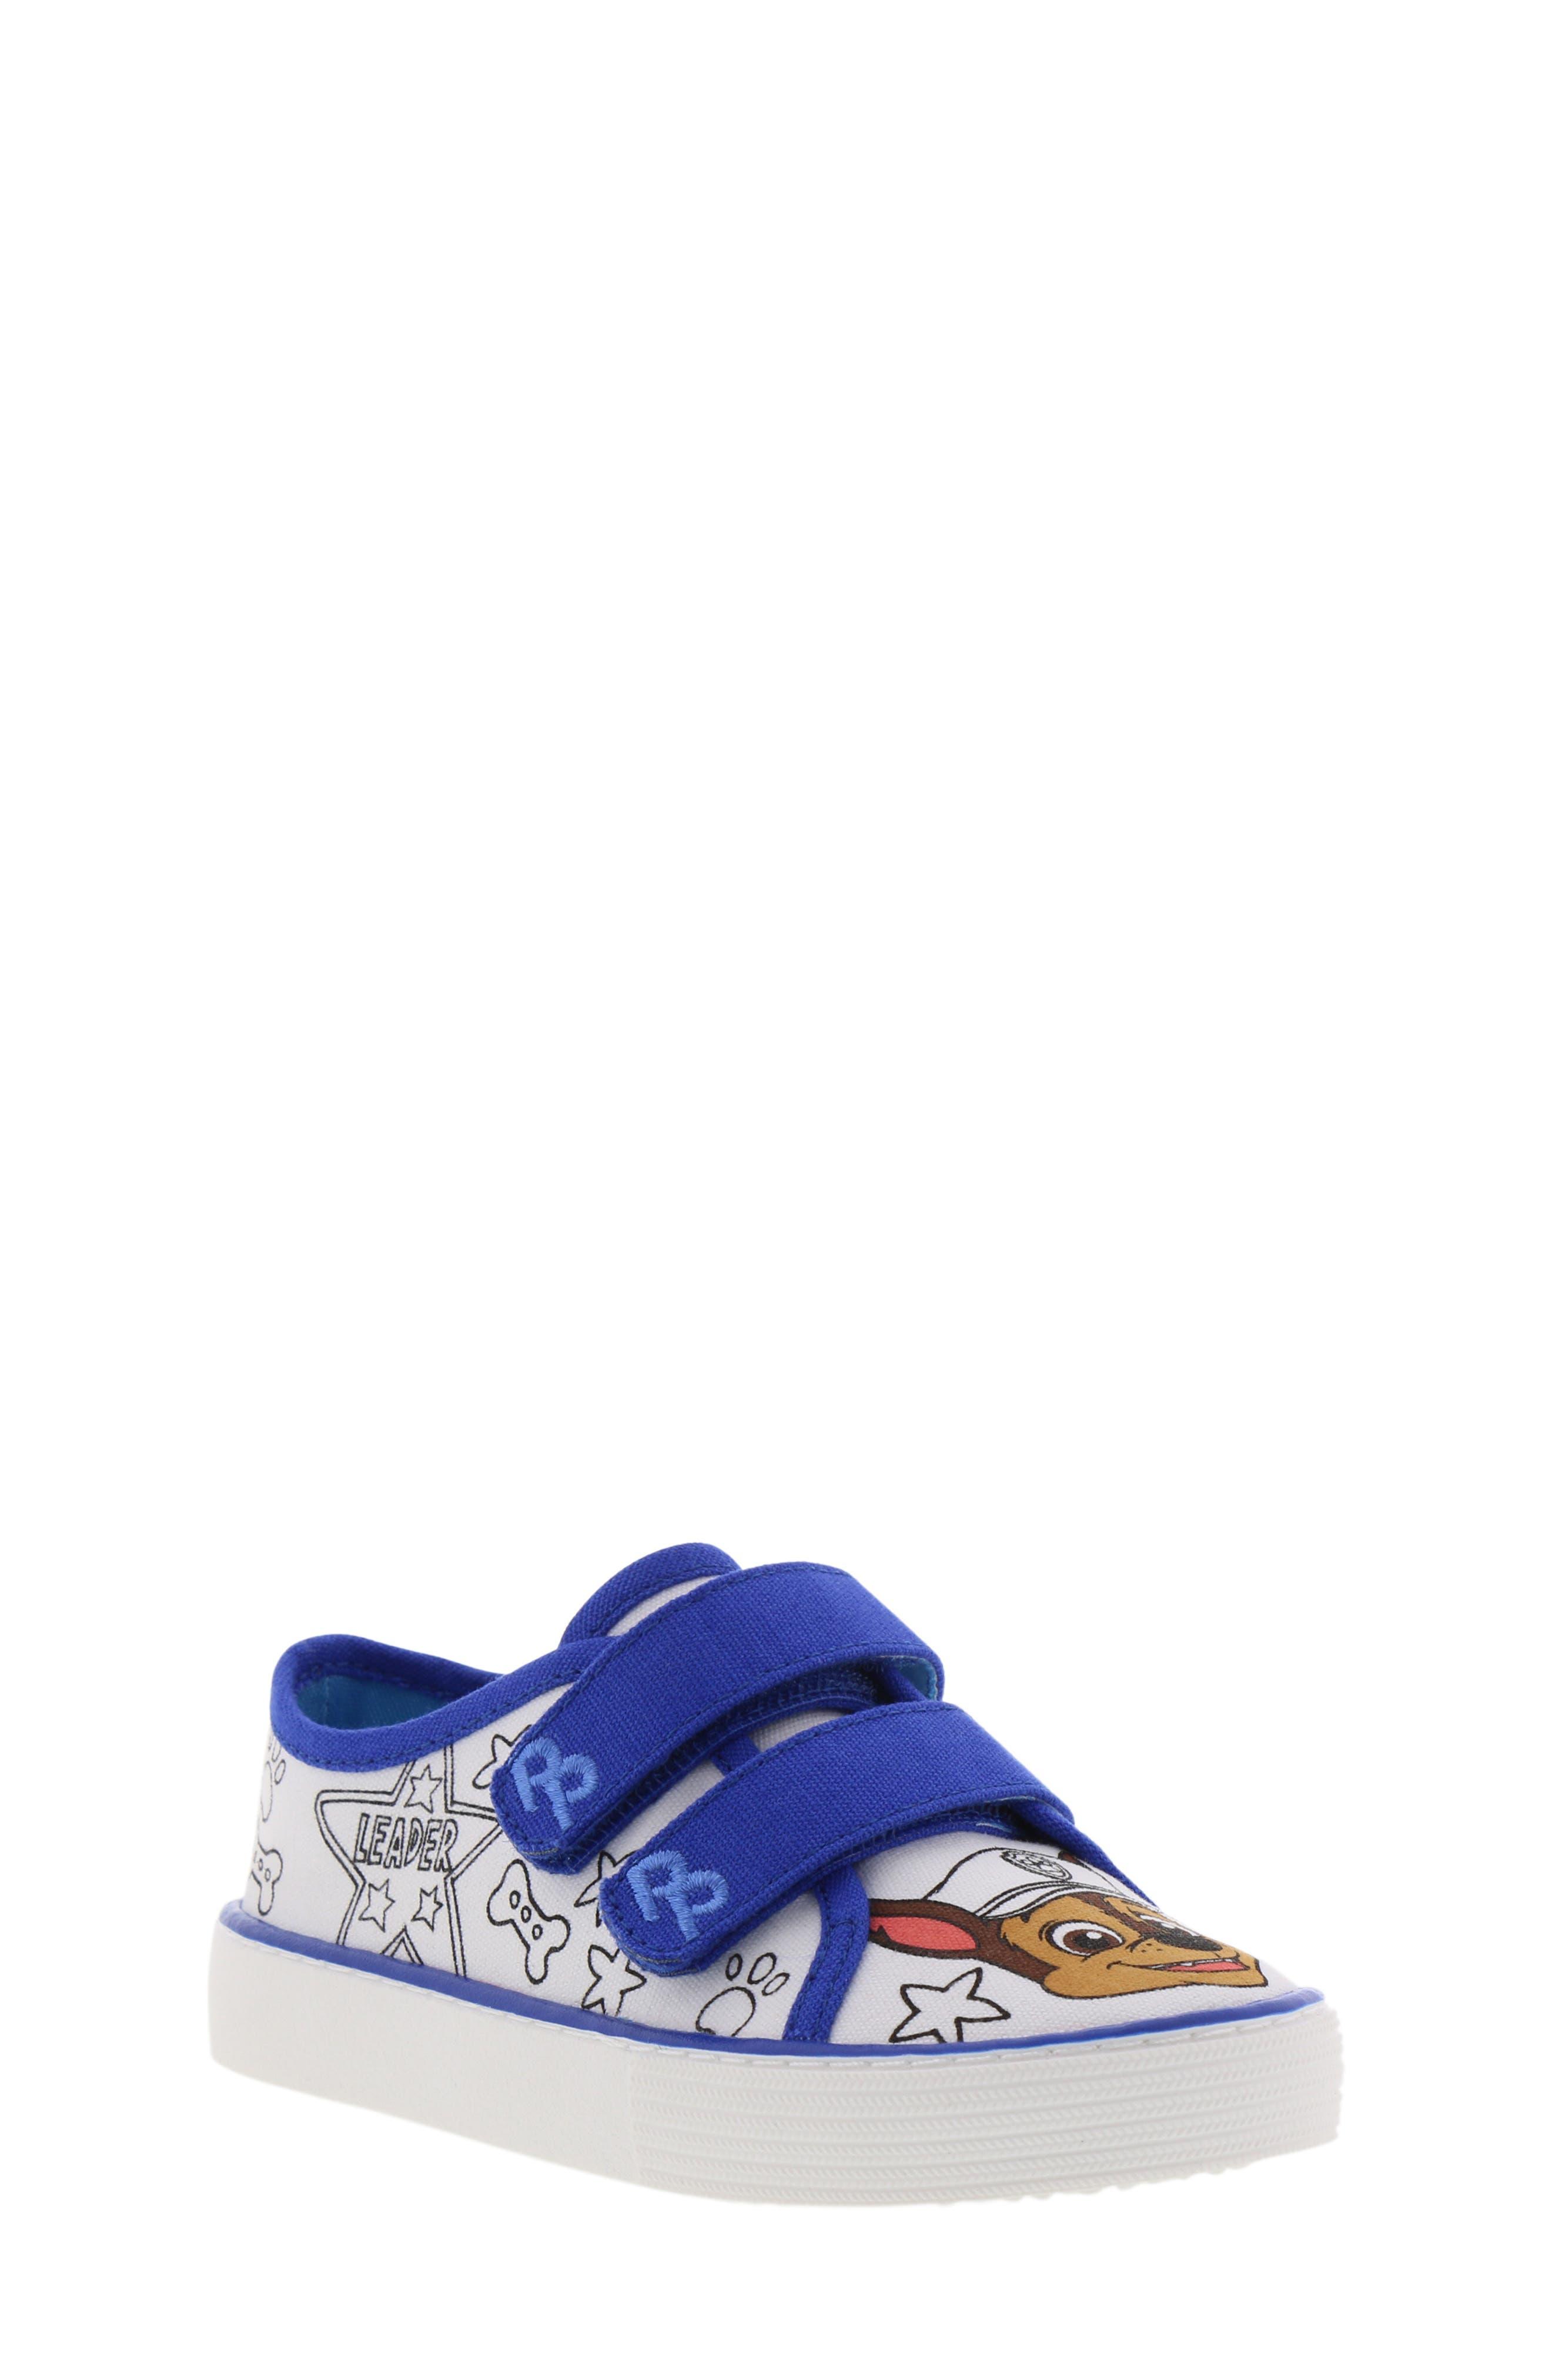 PAW PATROL, Chase Color DIY Sneaker, Main thumbnail 1, color, 118